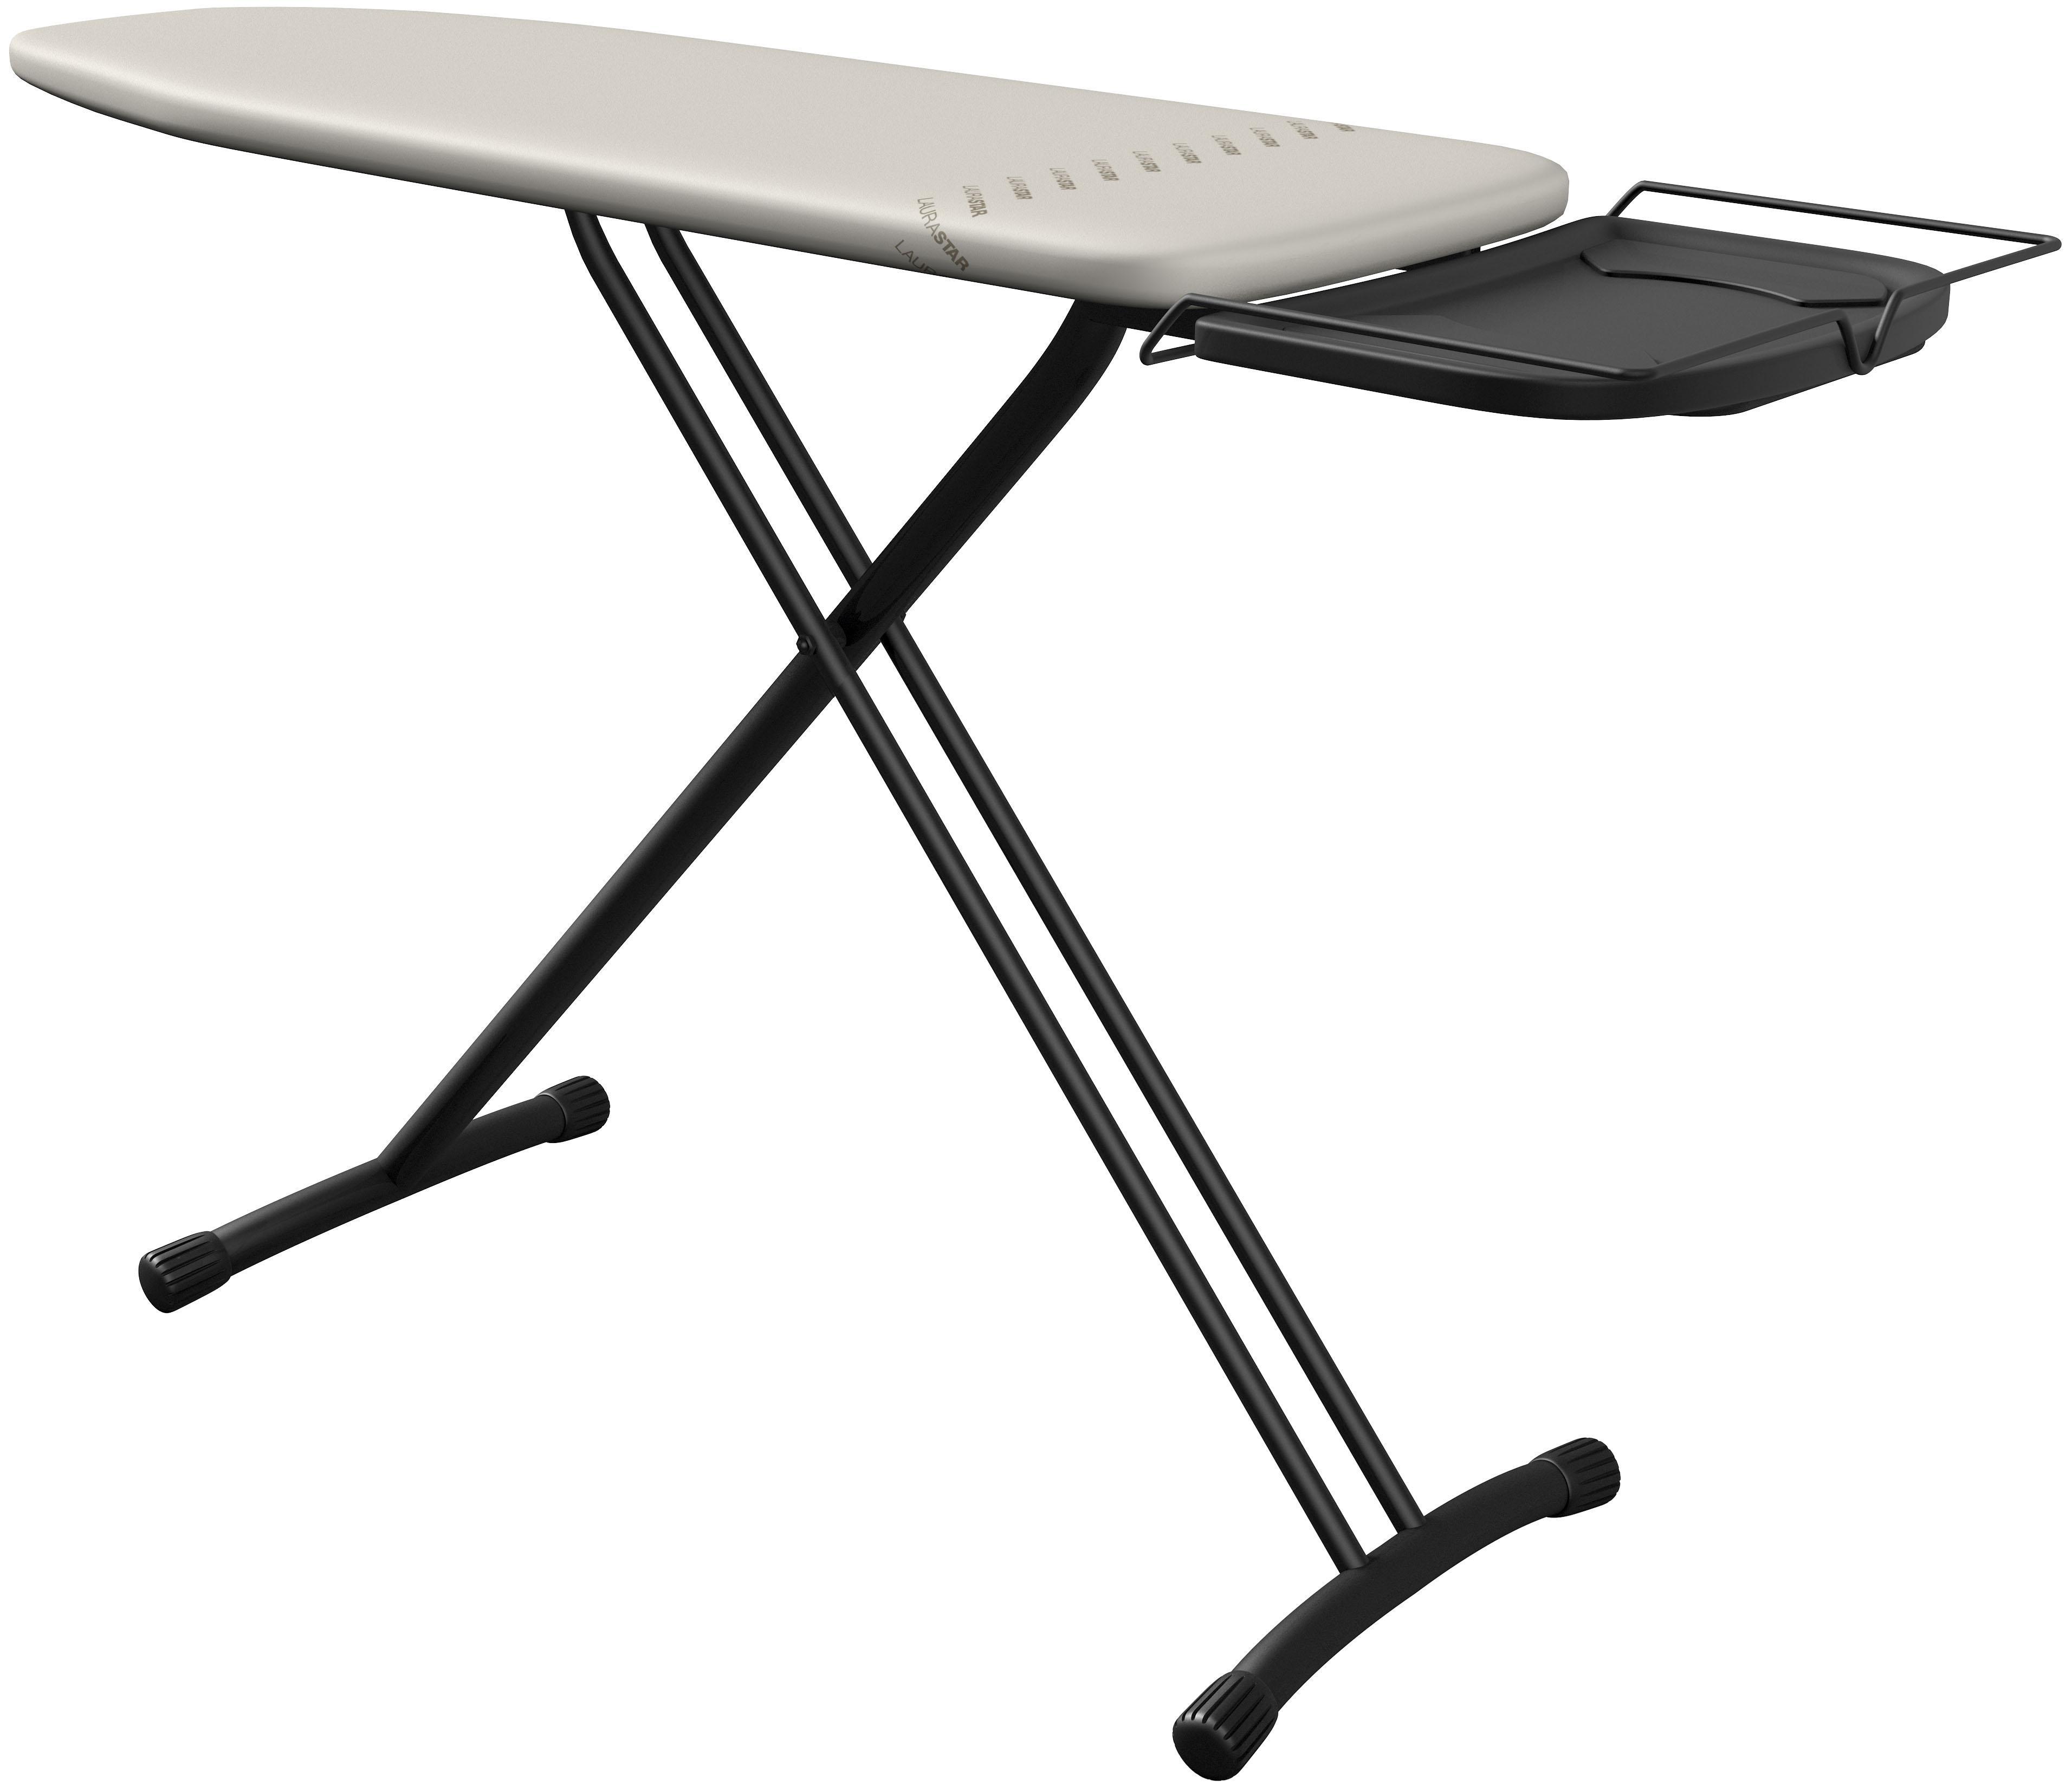 LAURASTAR Bügelbrett Comfortboard, Bügelfläche 120 x 38 cm | Flur & Diele > Haushaltsgeräte > Bügelbretter | Silberfarben | LAURA-STAR